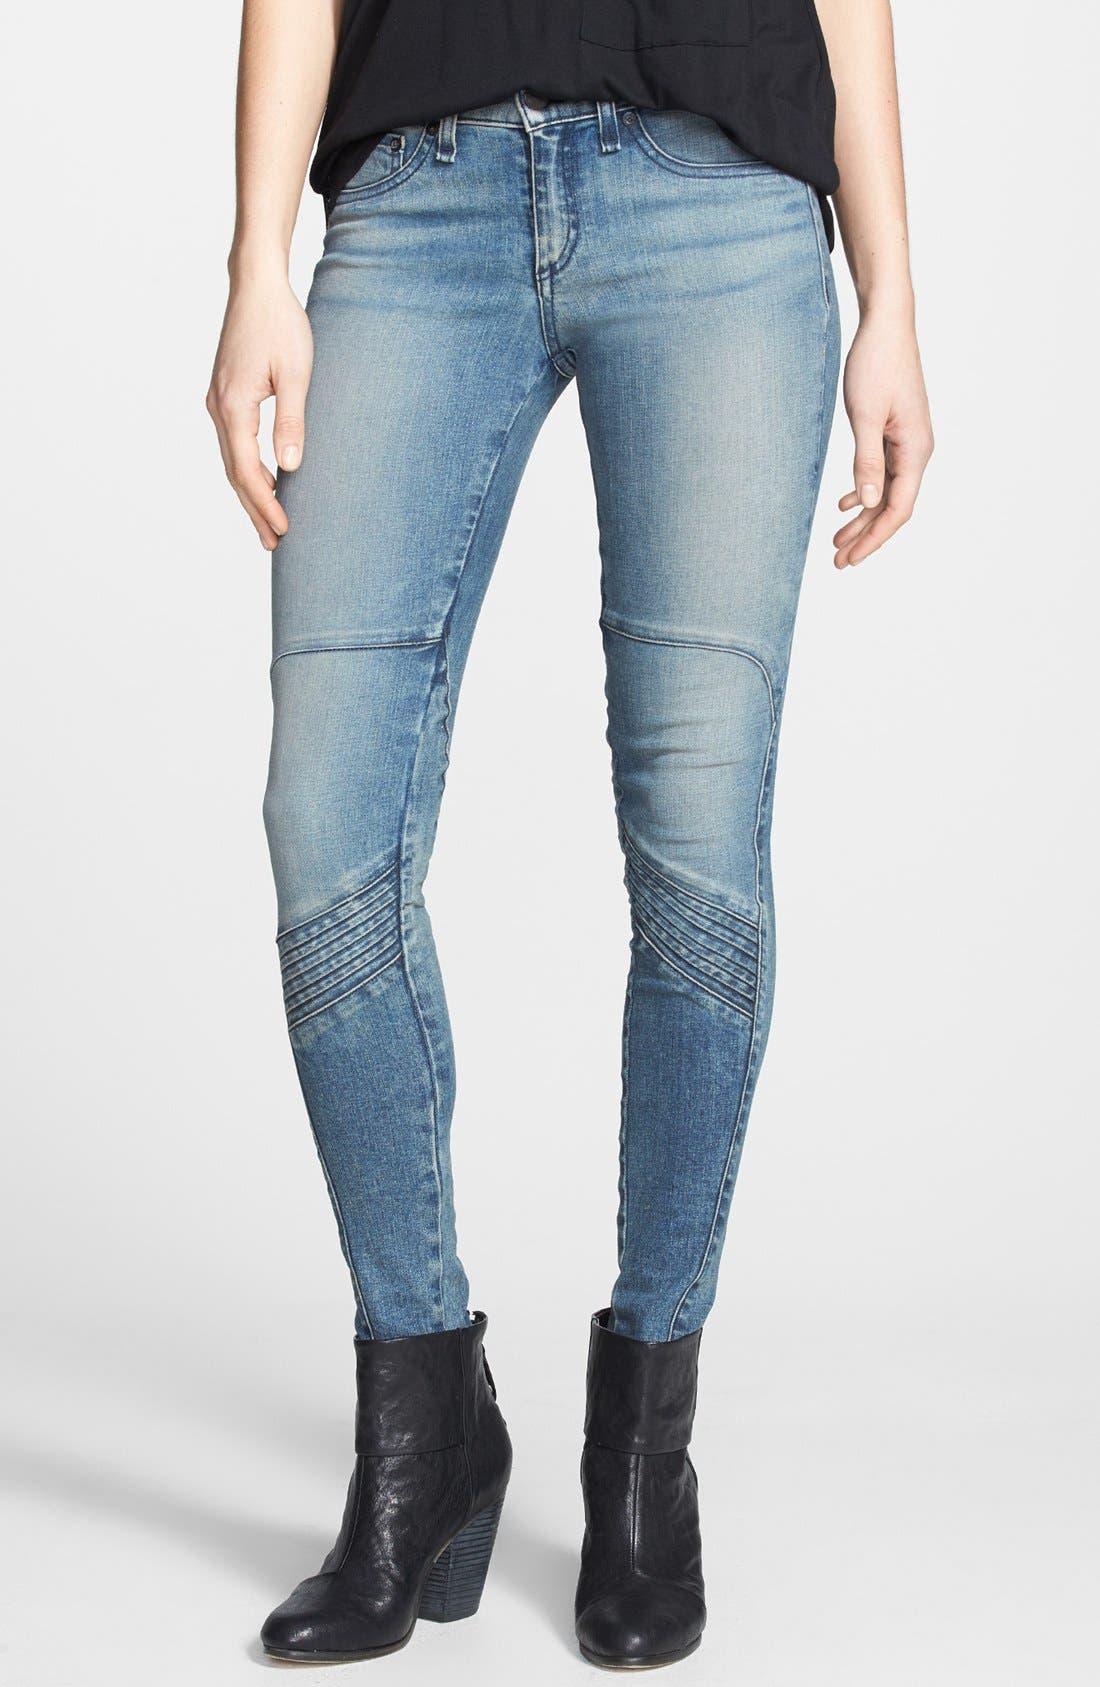 Alternate Image 1 Selected - rag & bone/JEAN 'Samurai Legging' Skinny Jeans (Cardiff)